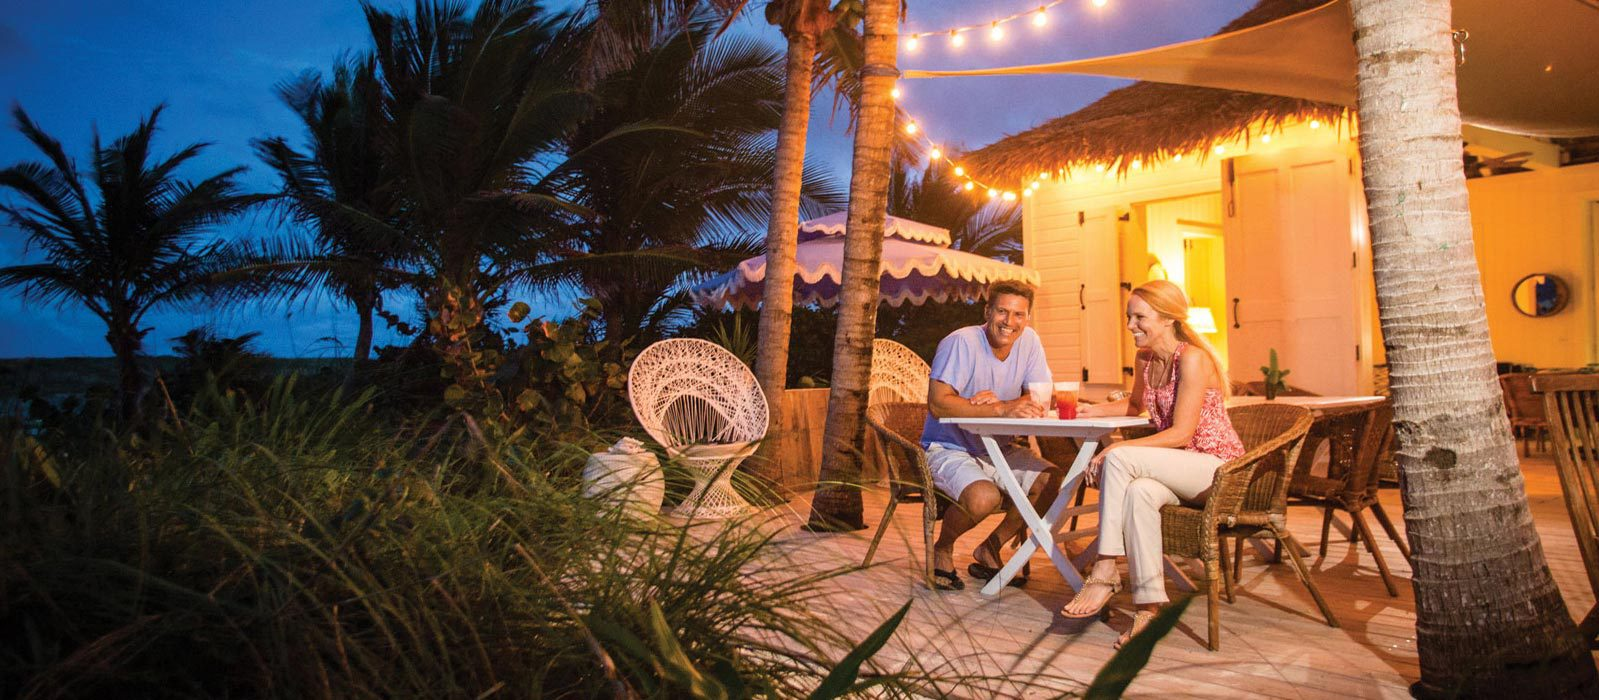 Schooner Bay Bahamas Lifestyle